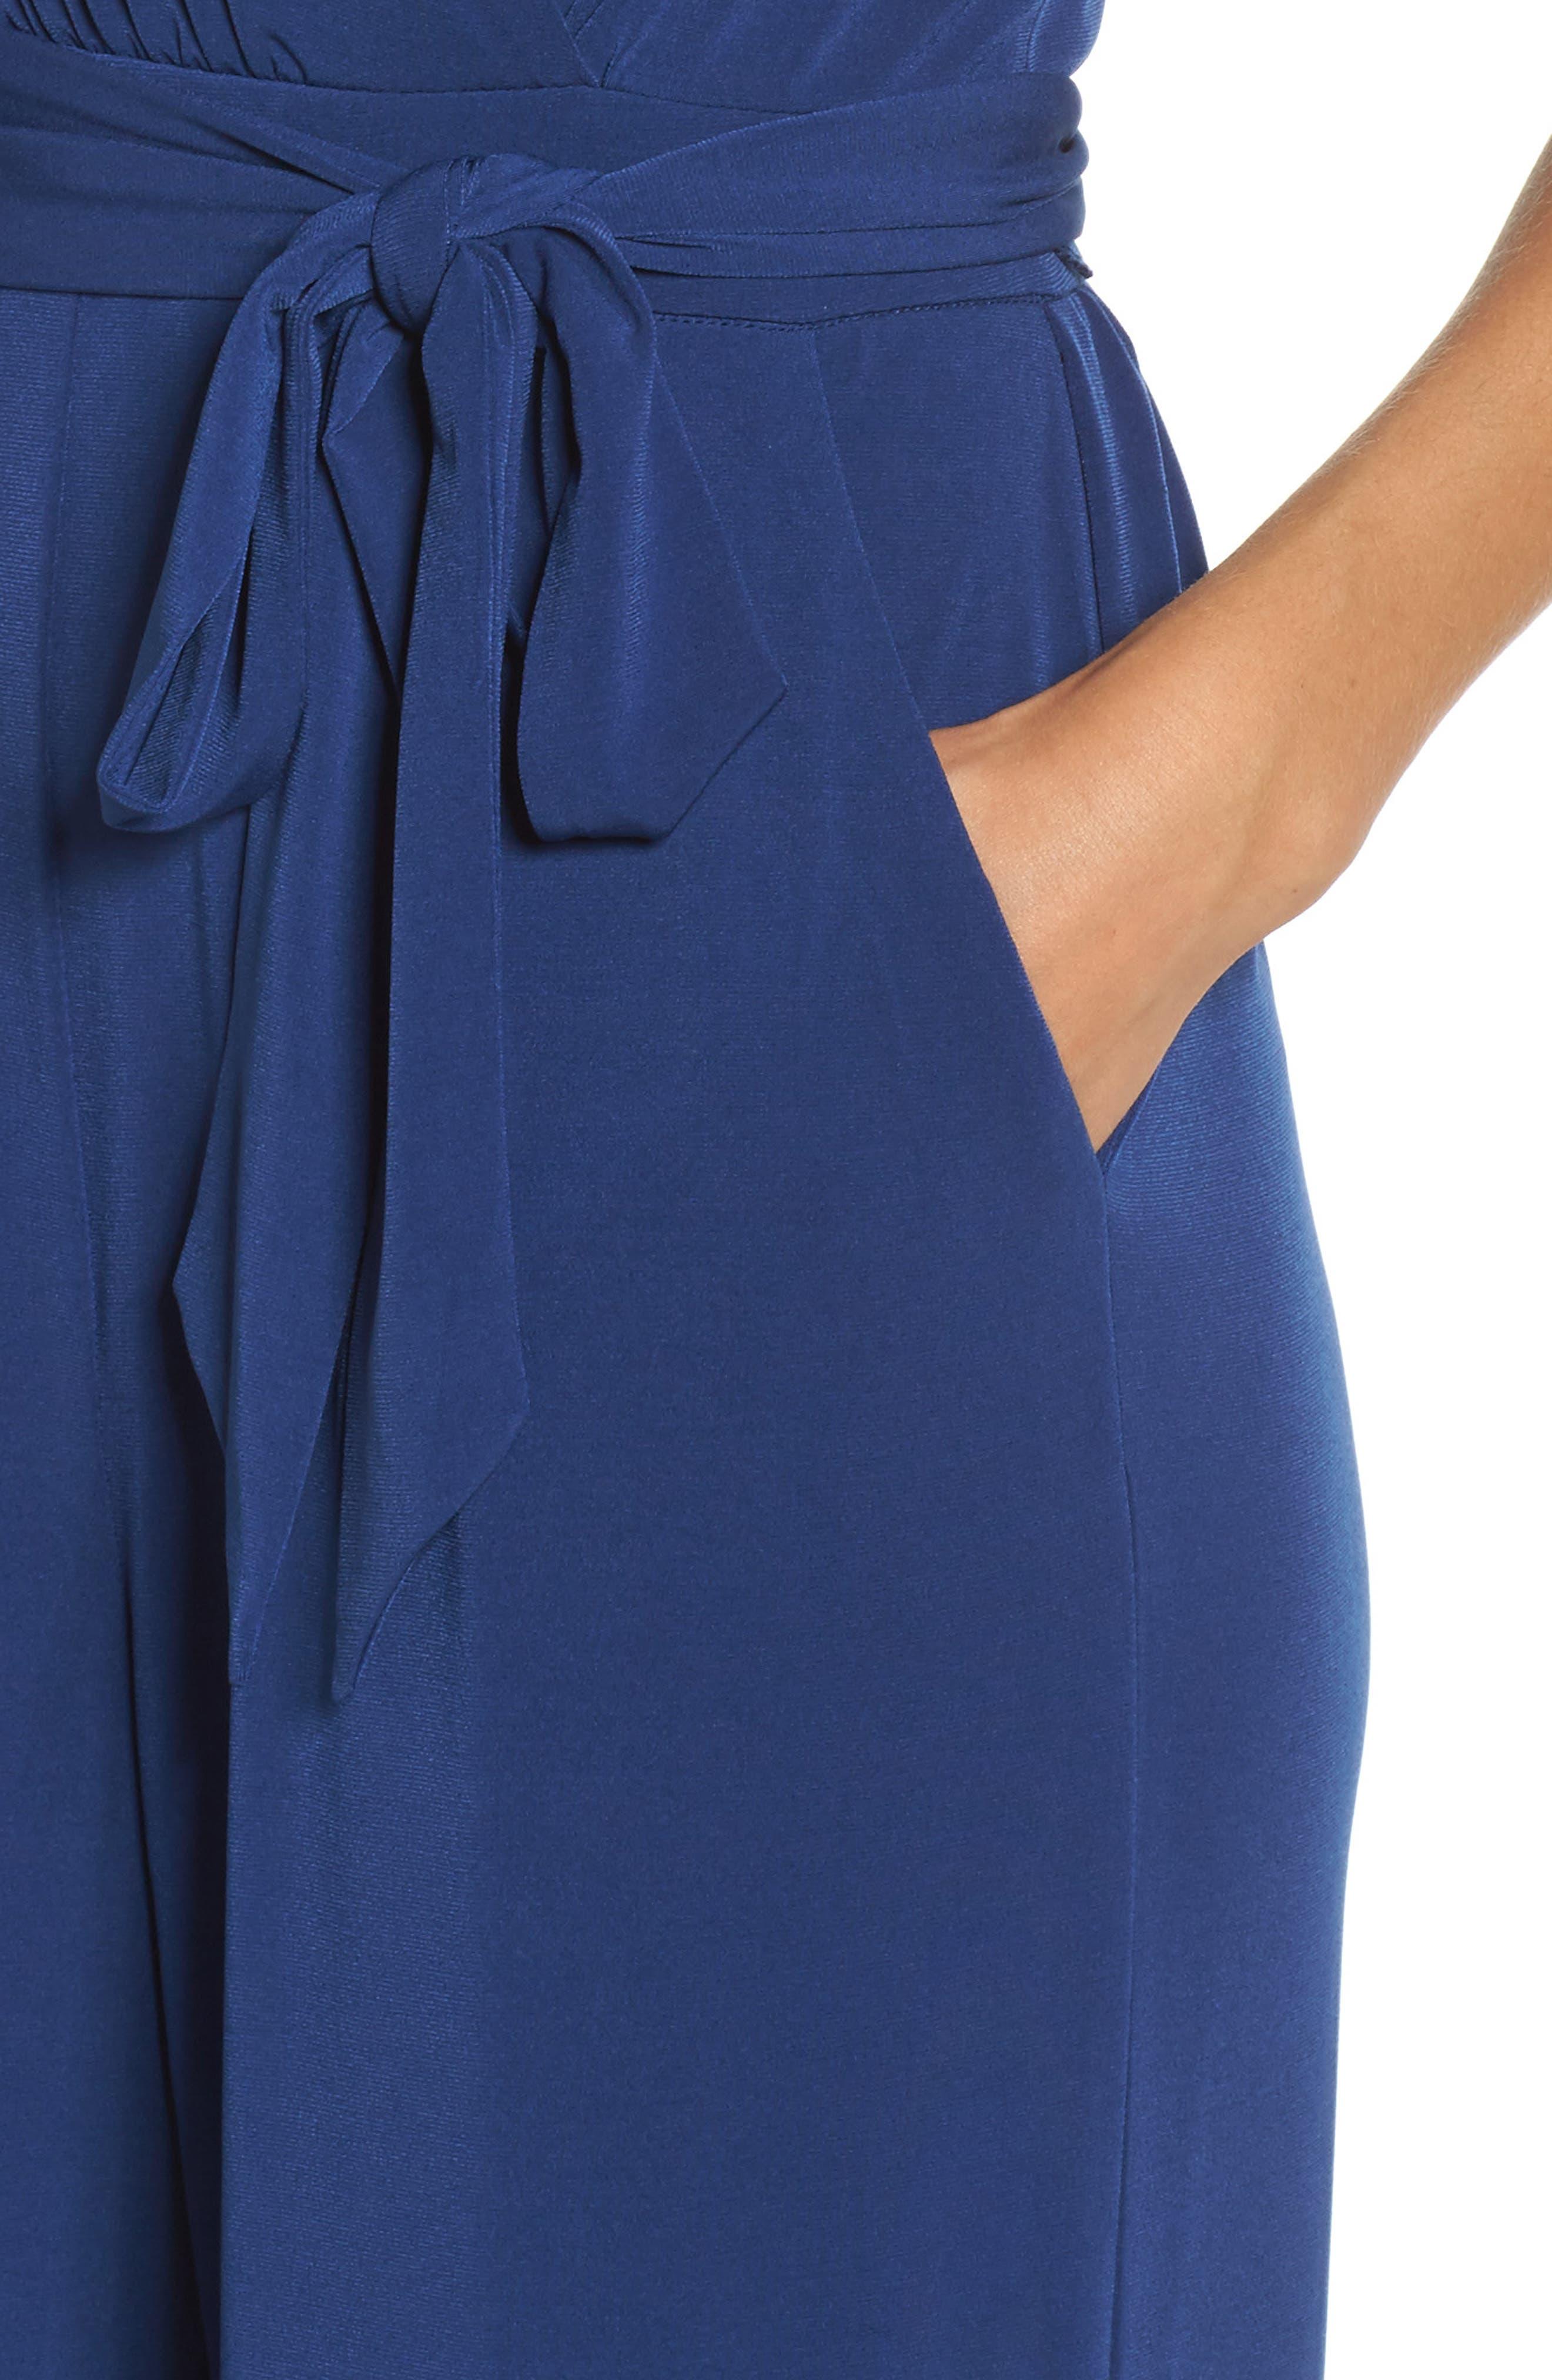 Alternate Image 4  - Vince Camuto Faux Wrap Jersey Jumpsuit (Regular & Petite)